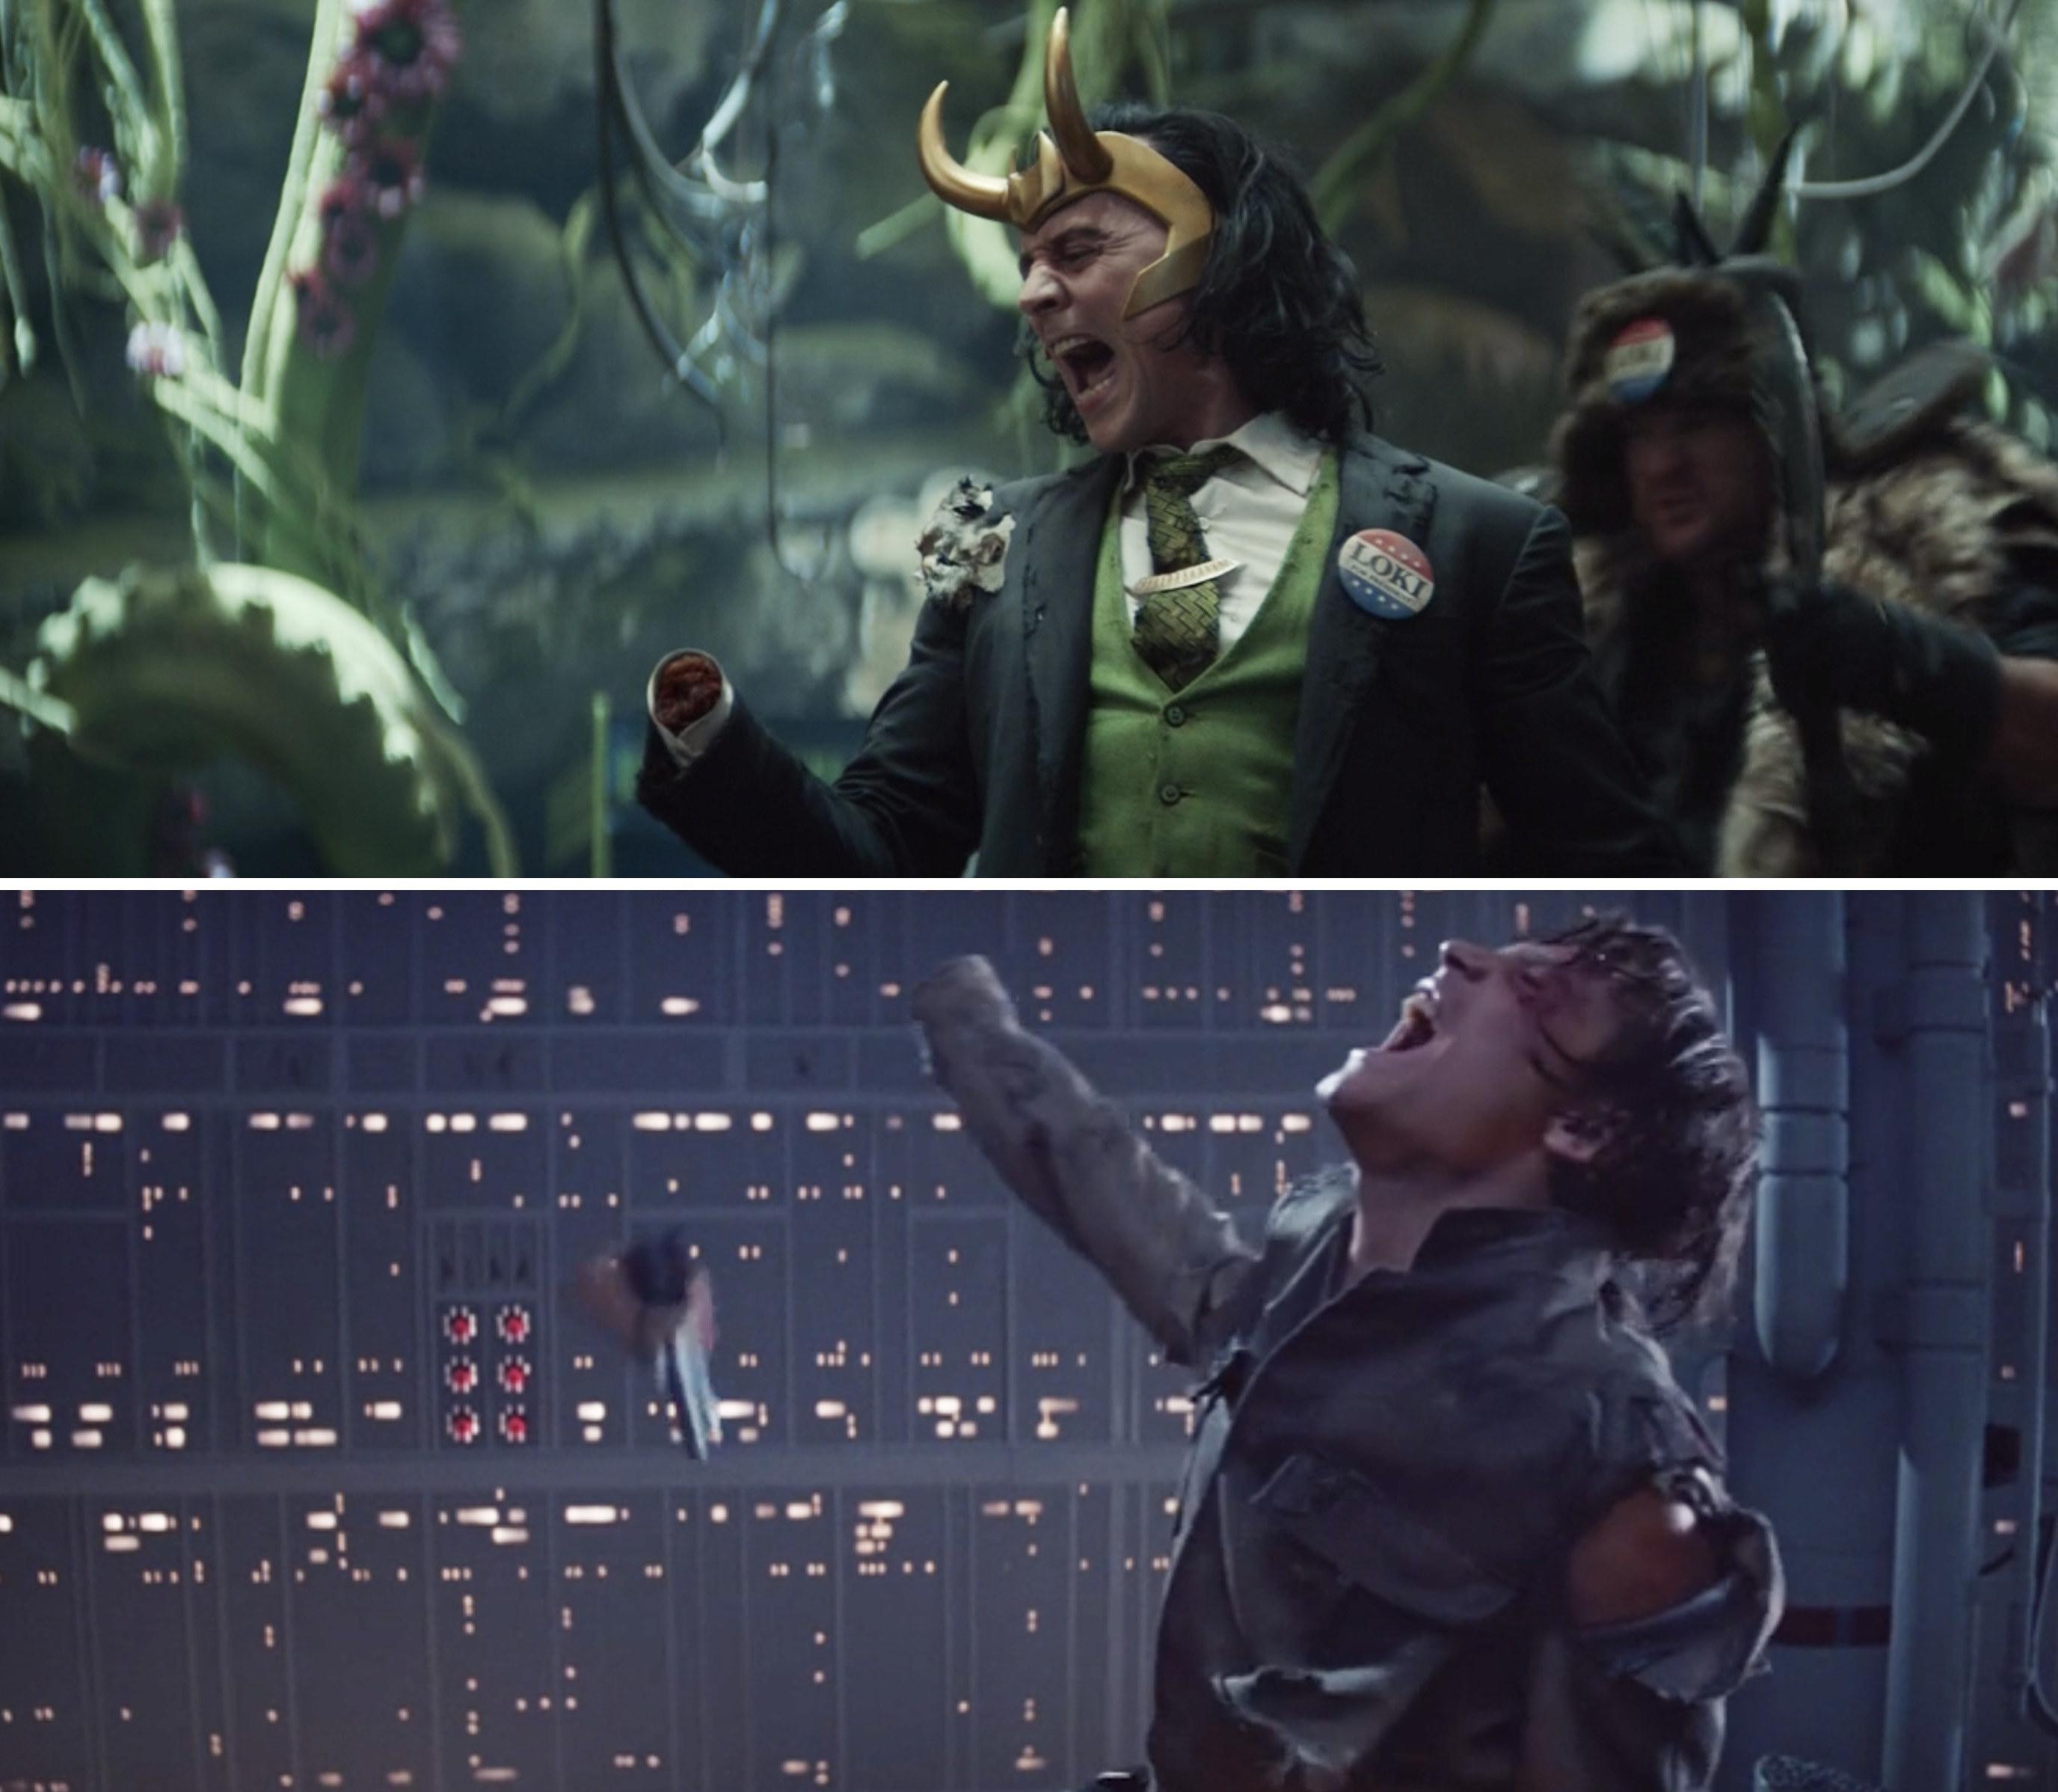 President Loki screaming after his hand is cut off vs. Luke Skywalker doing the same